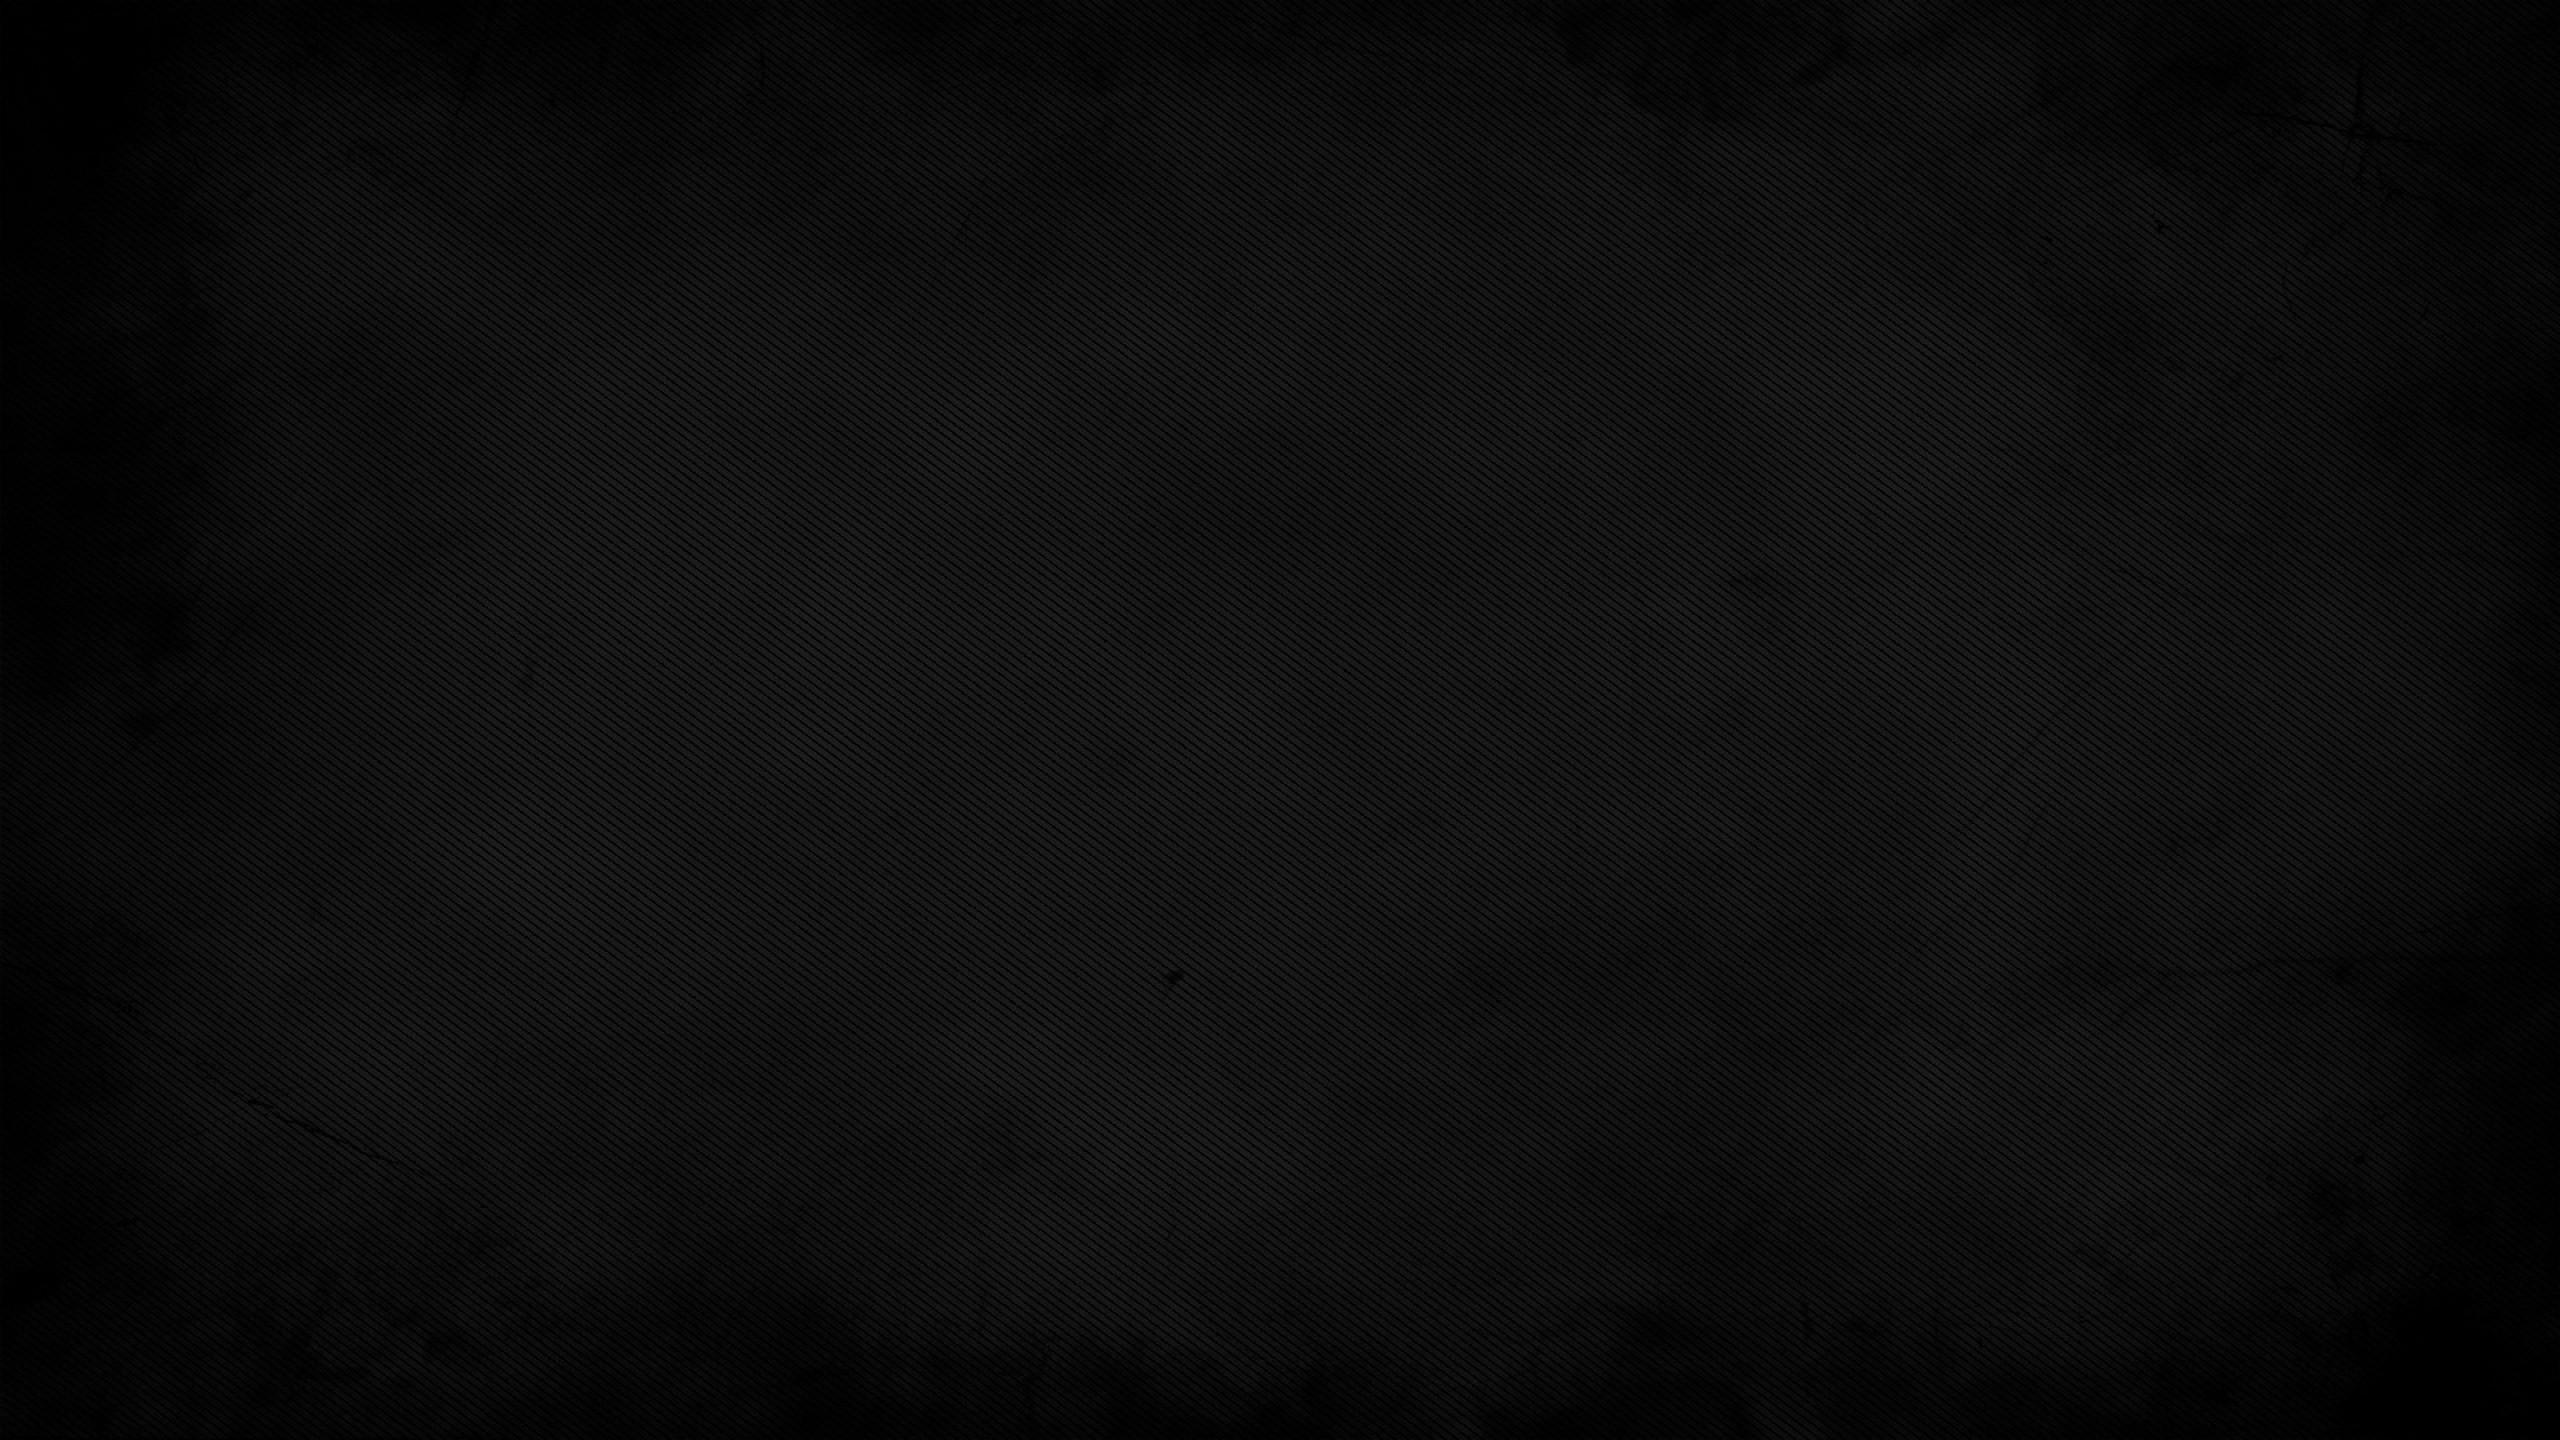 Download Line, Obliquely, Background, Band, Black Wallpaper .